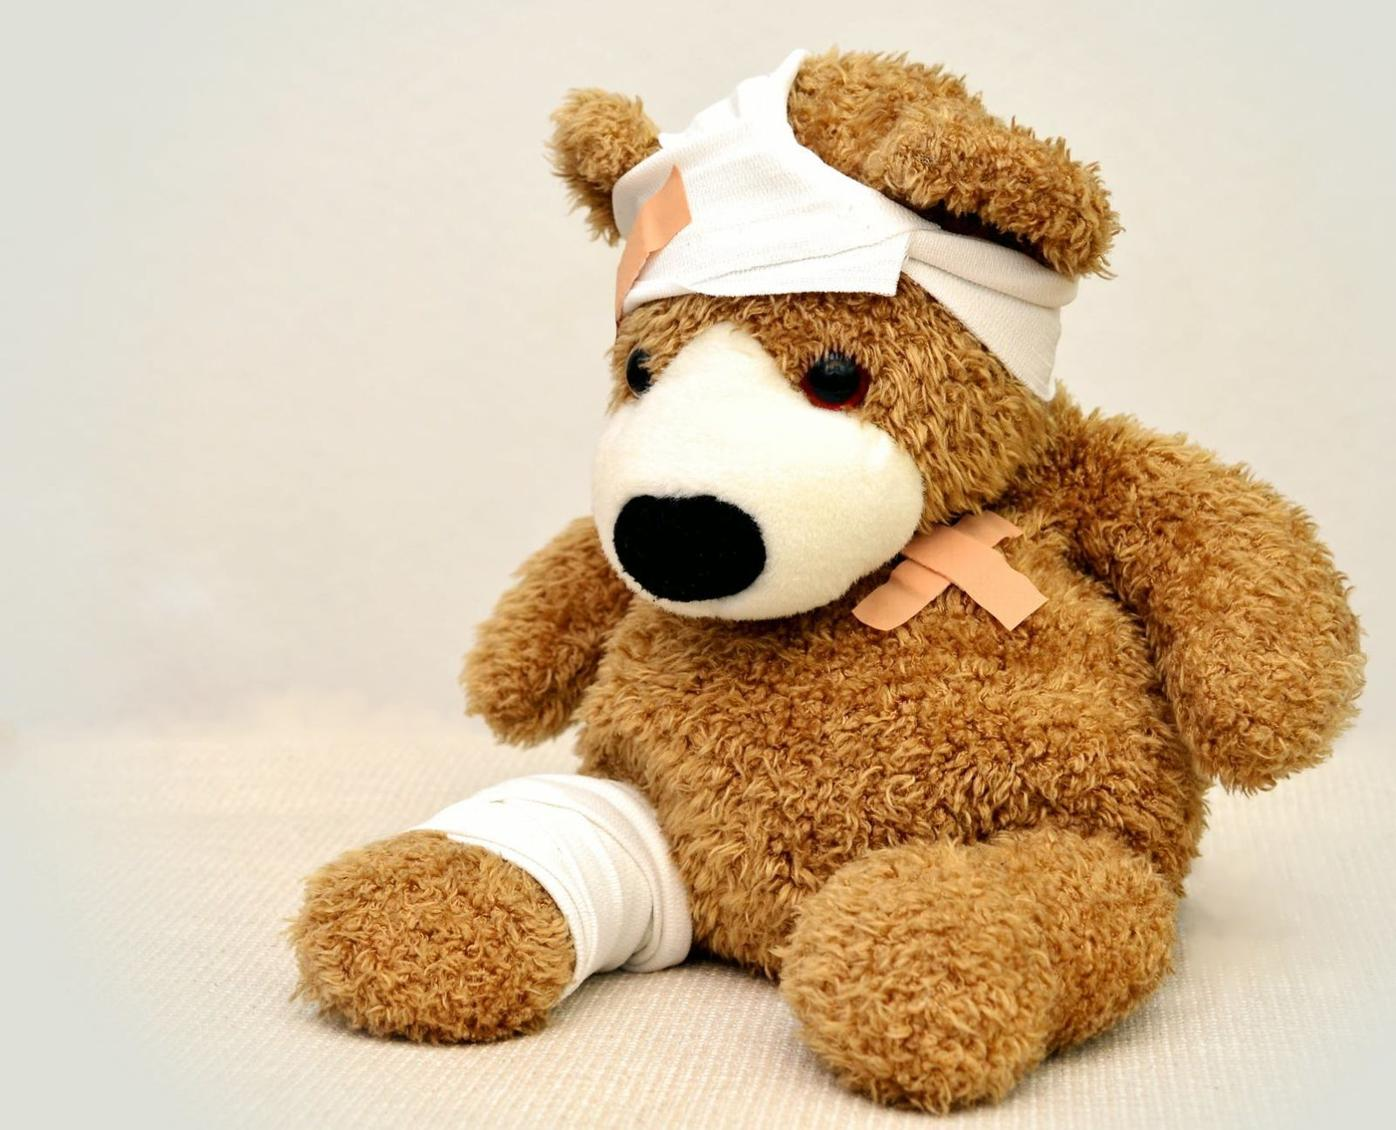 teddybearbandages.jpg